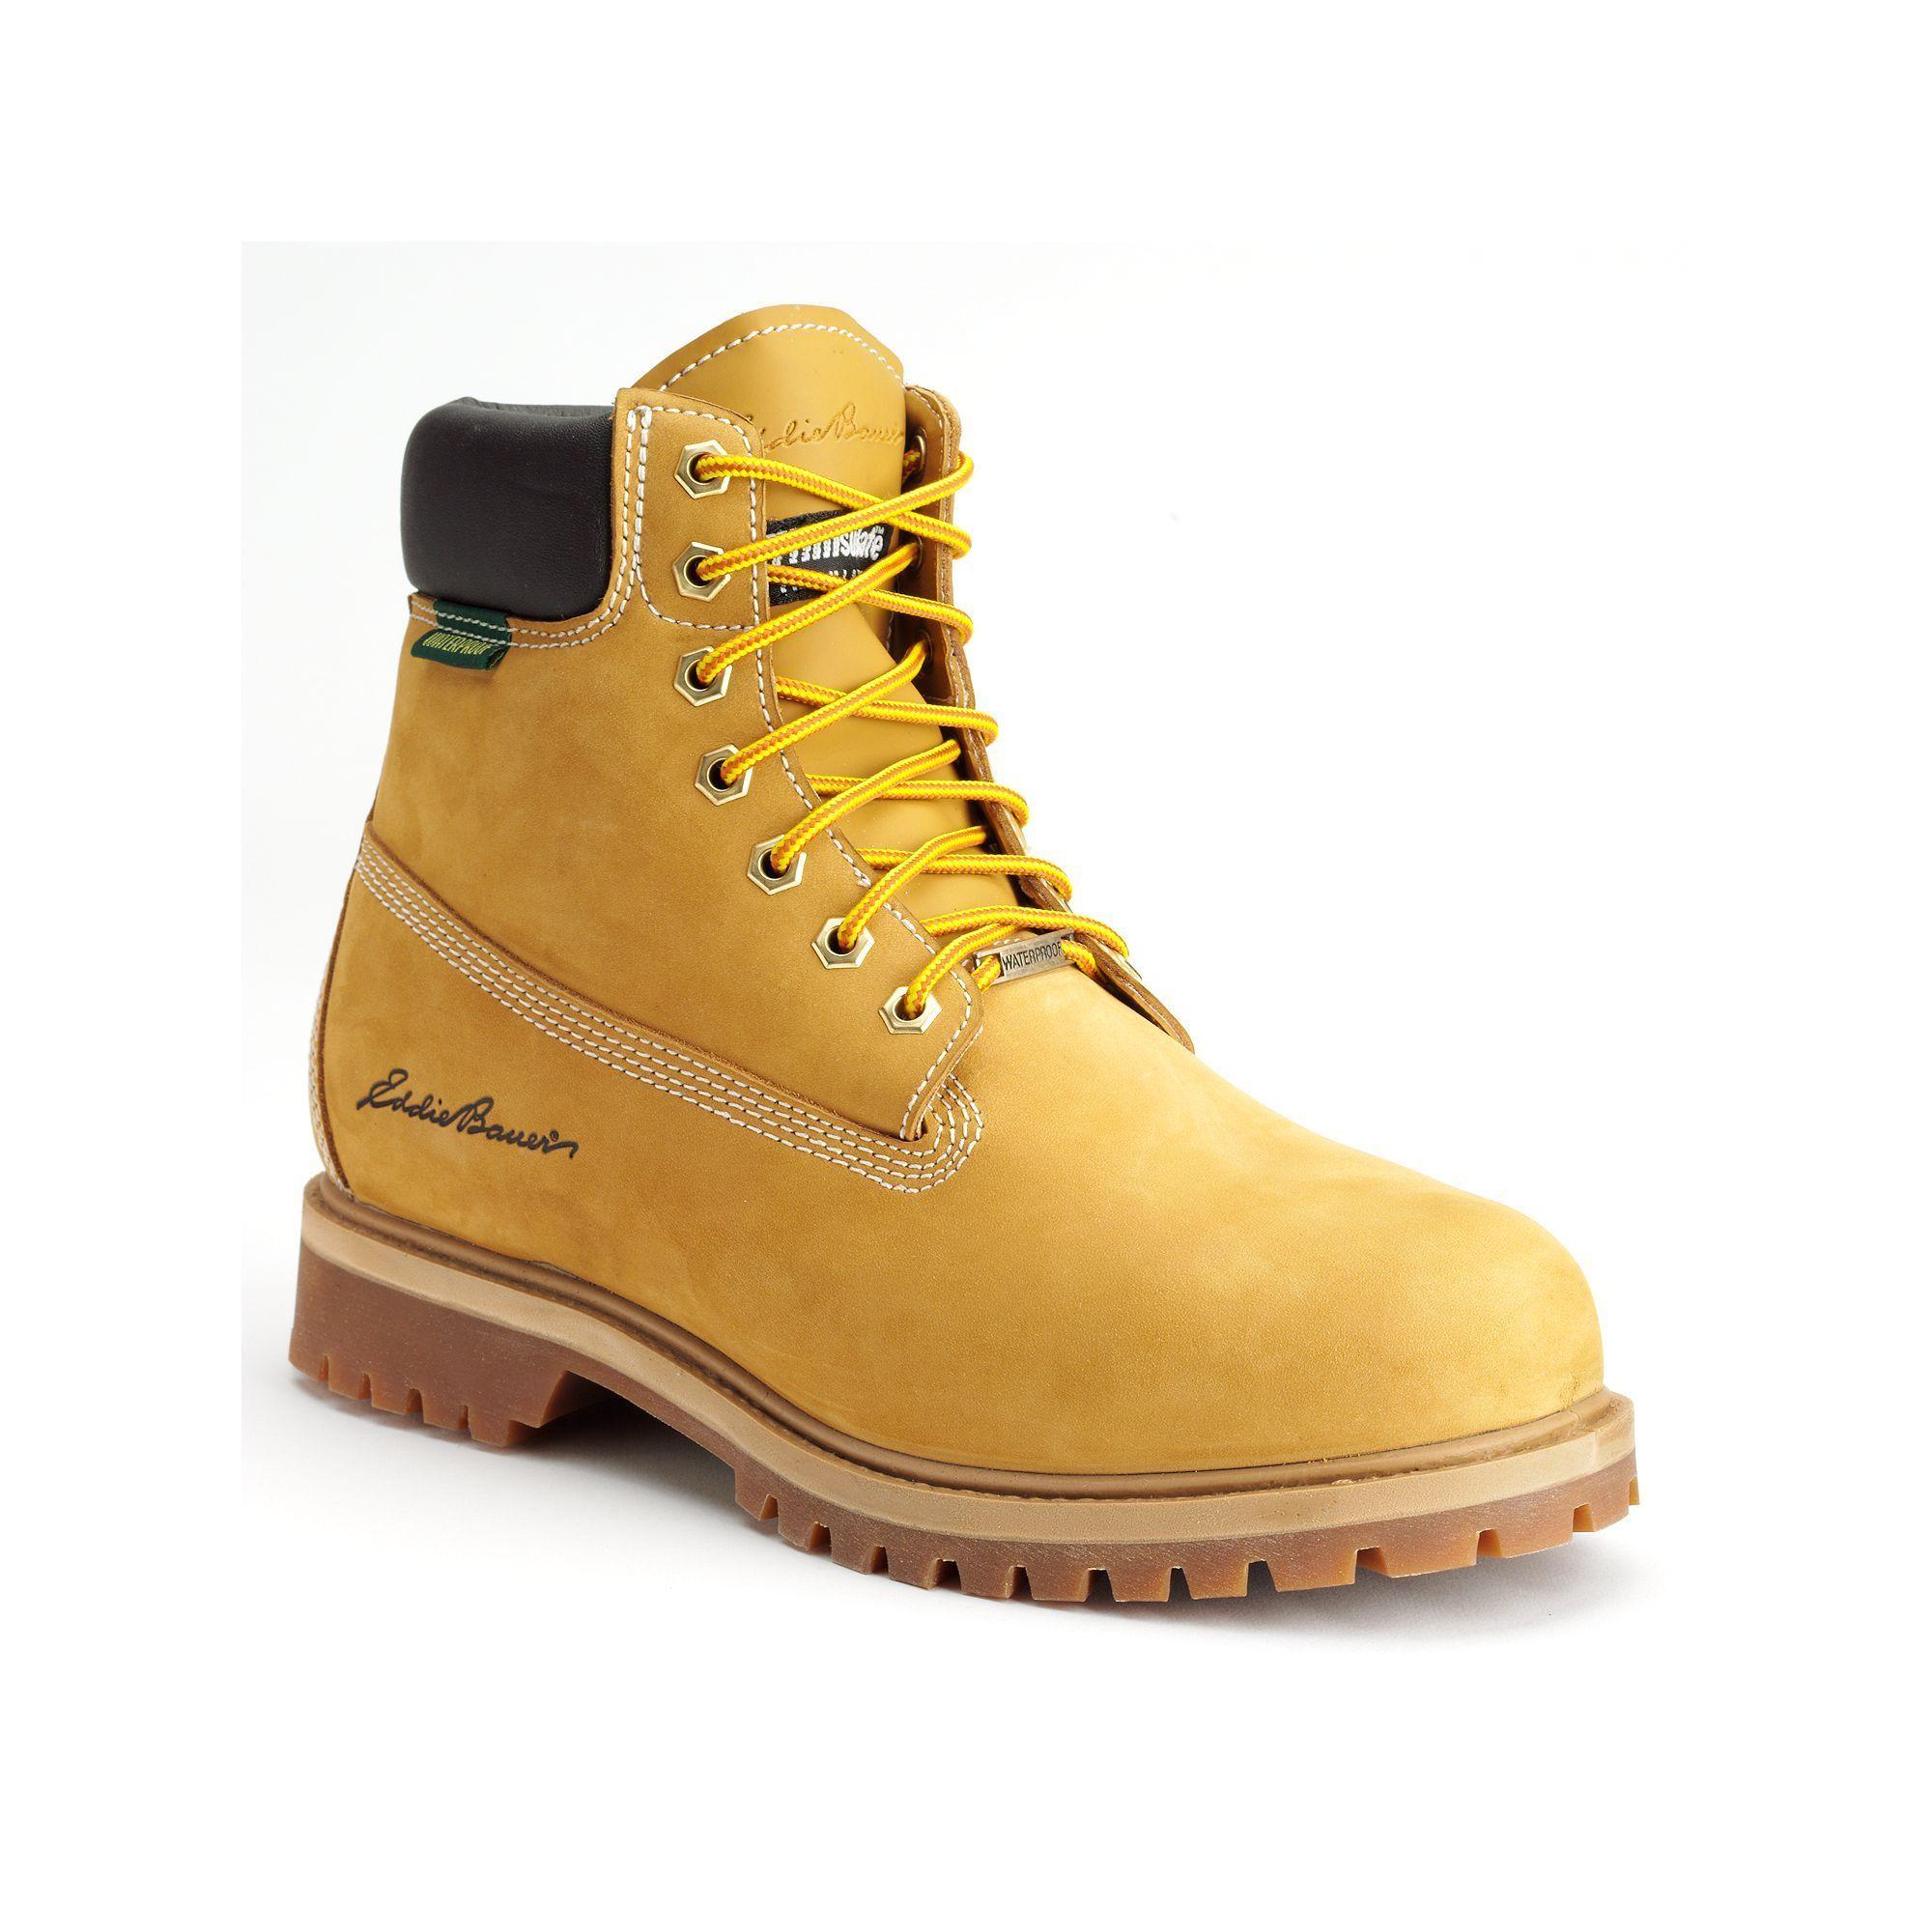 Boots men, Boots, Mens hiking boots